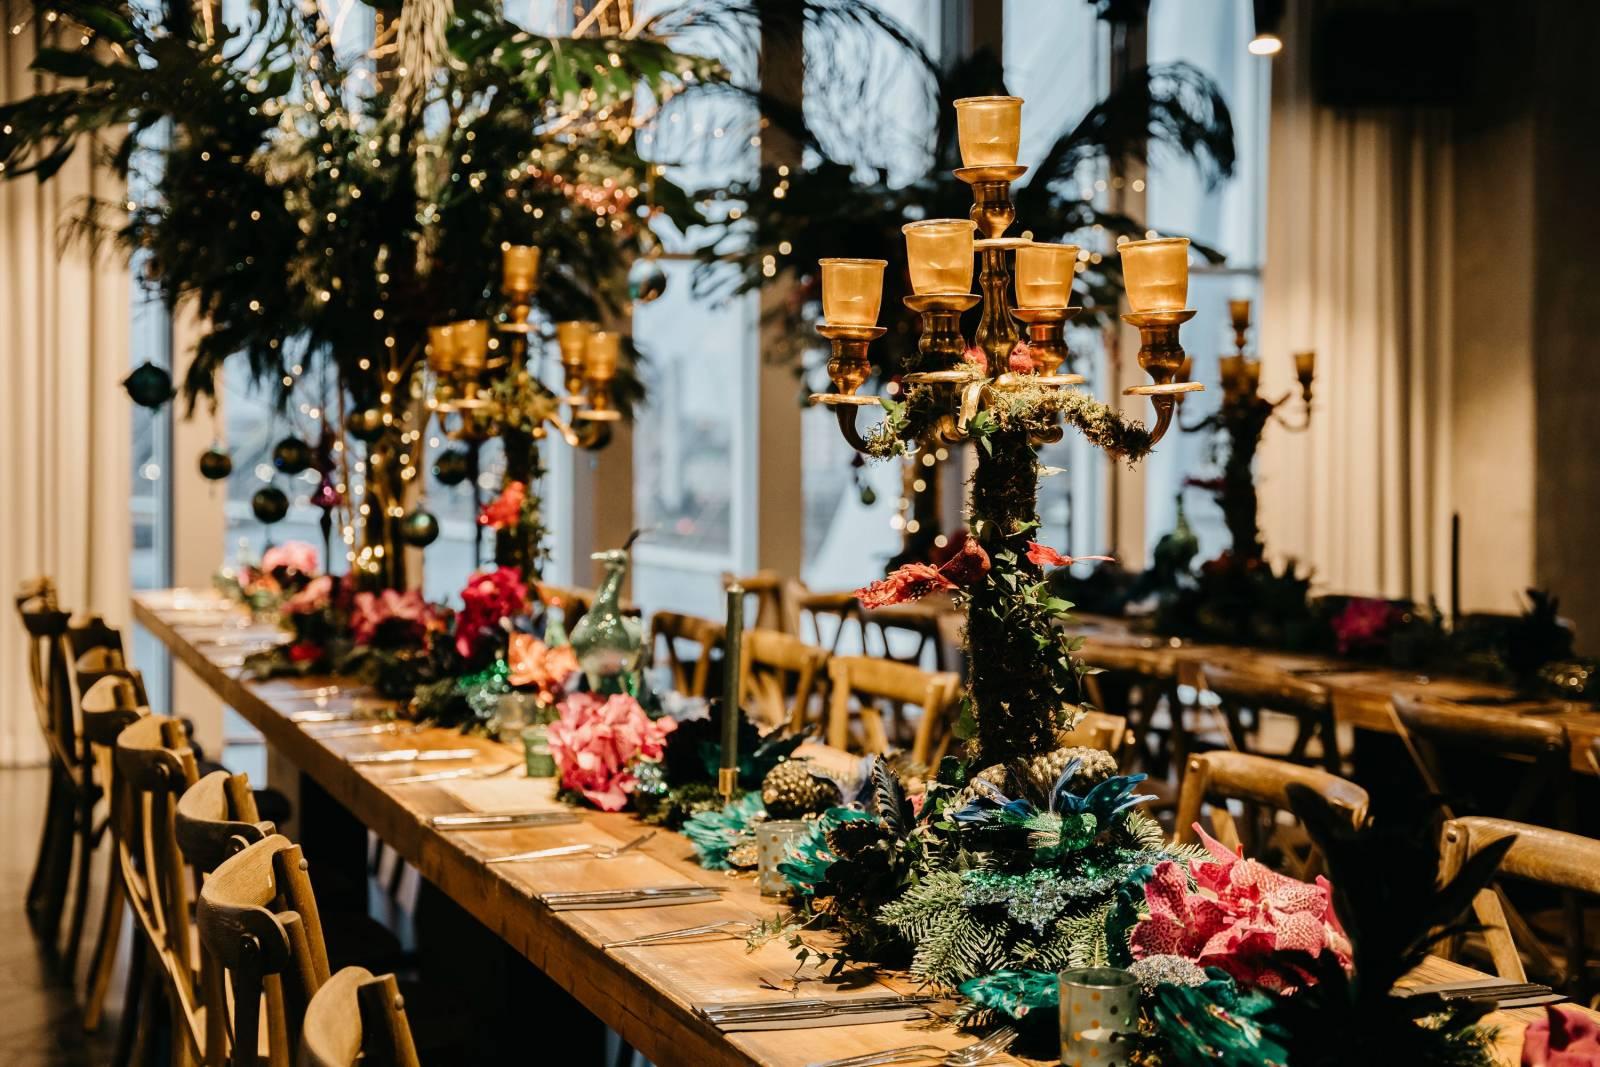 Wolterinck Event Decoration - Verhuur & Decoratie - House of Events - 35